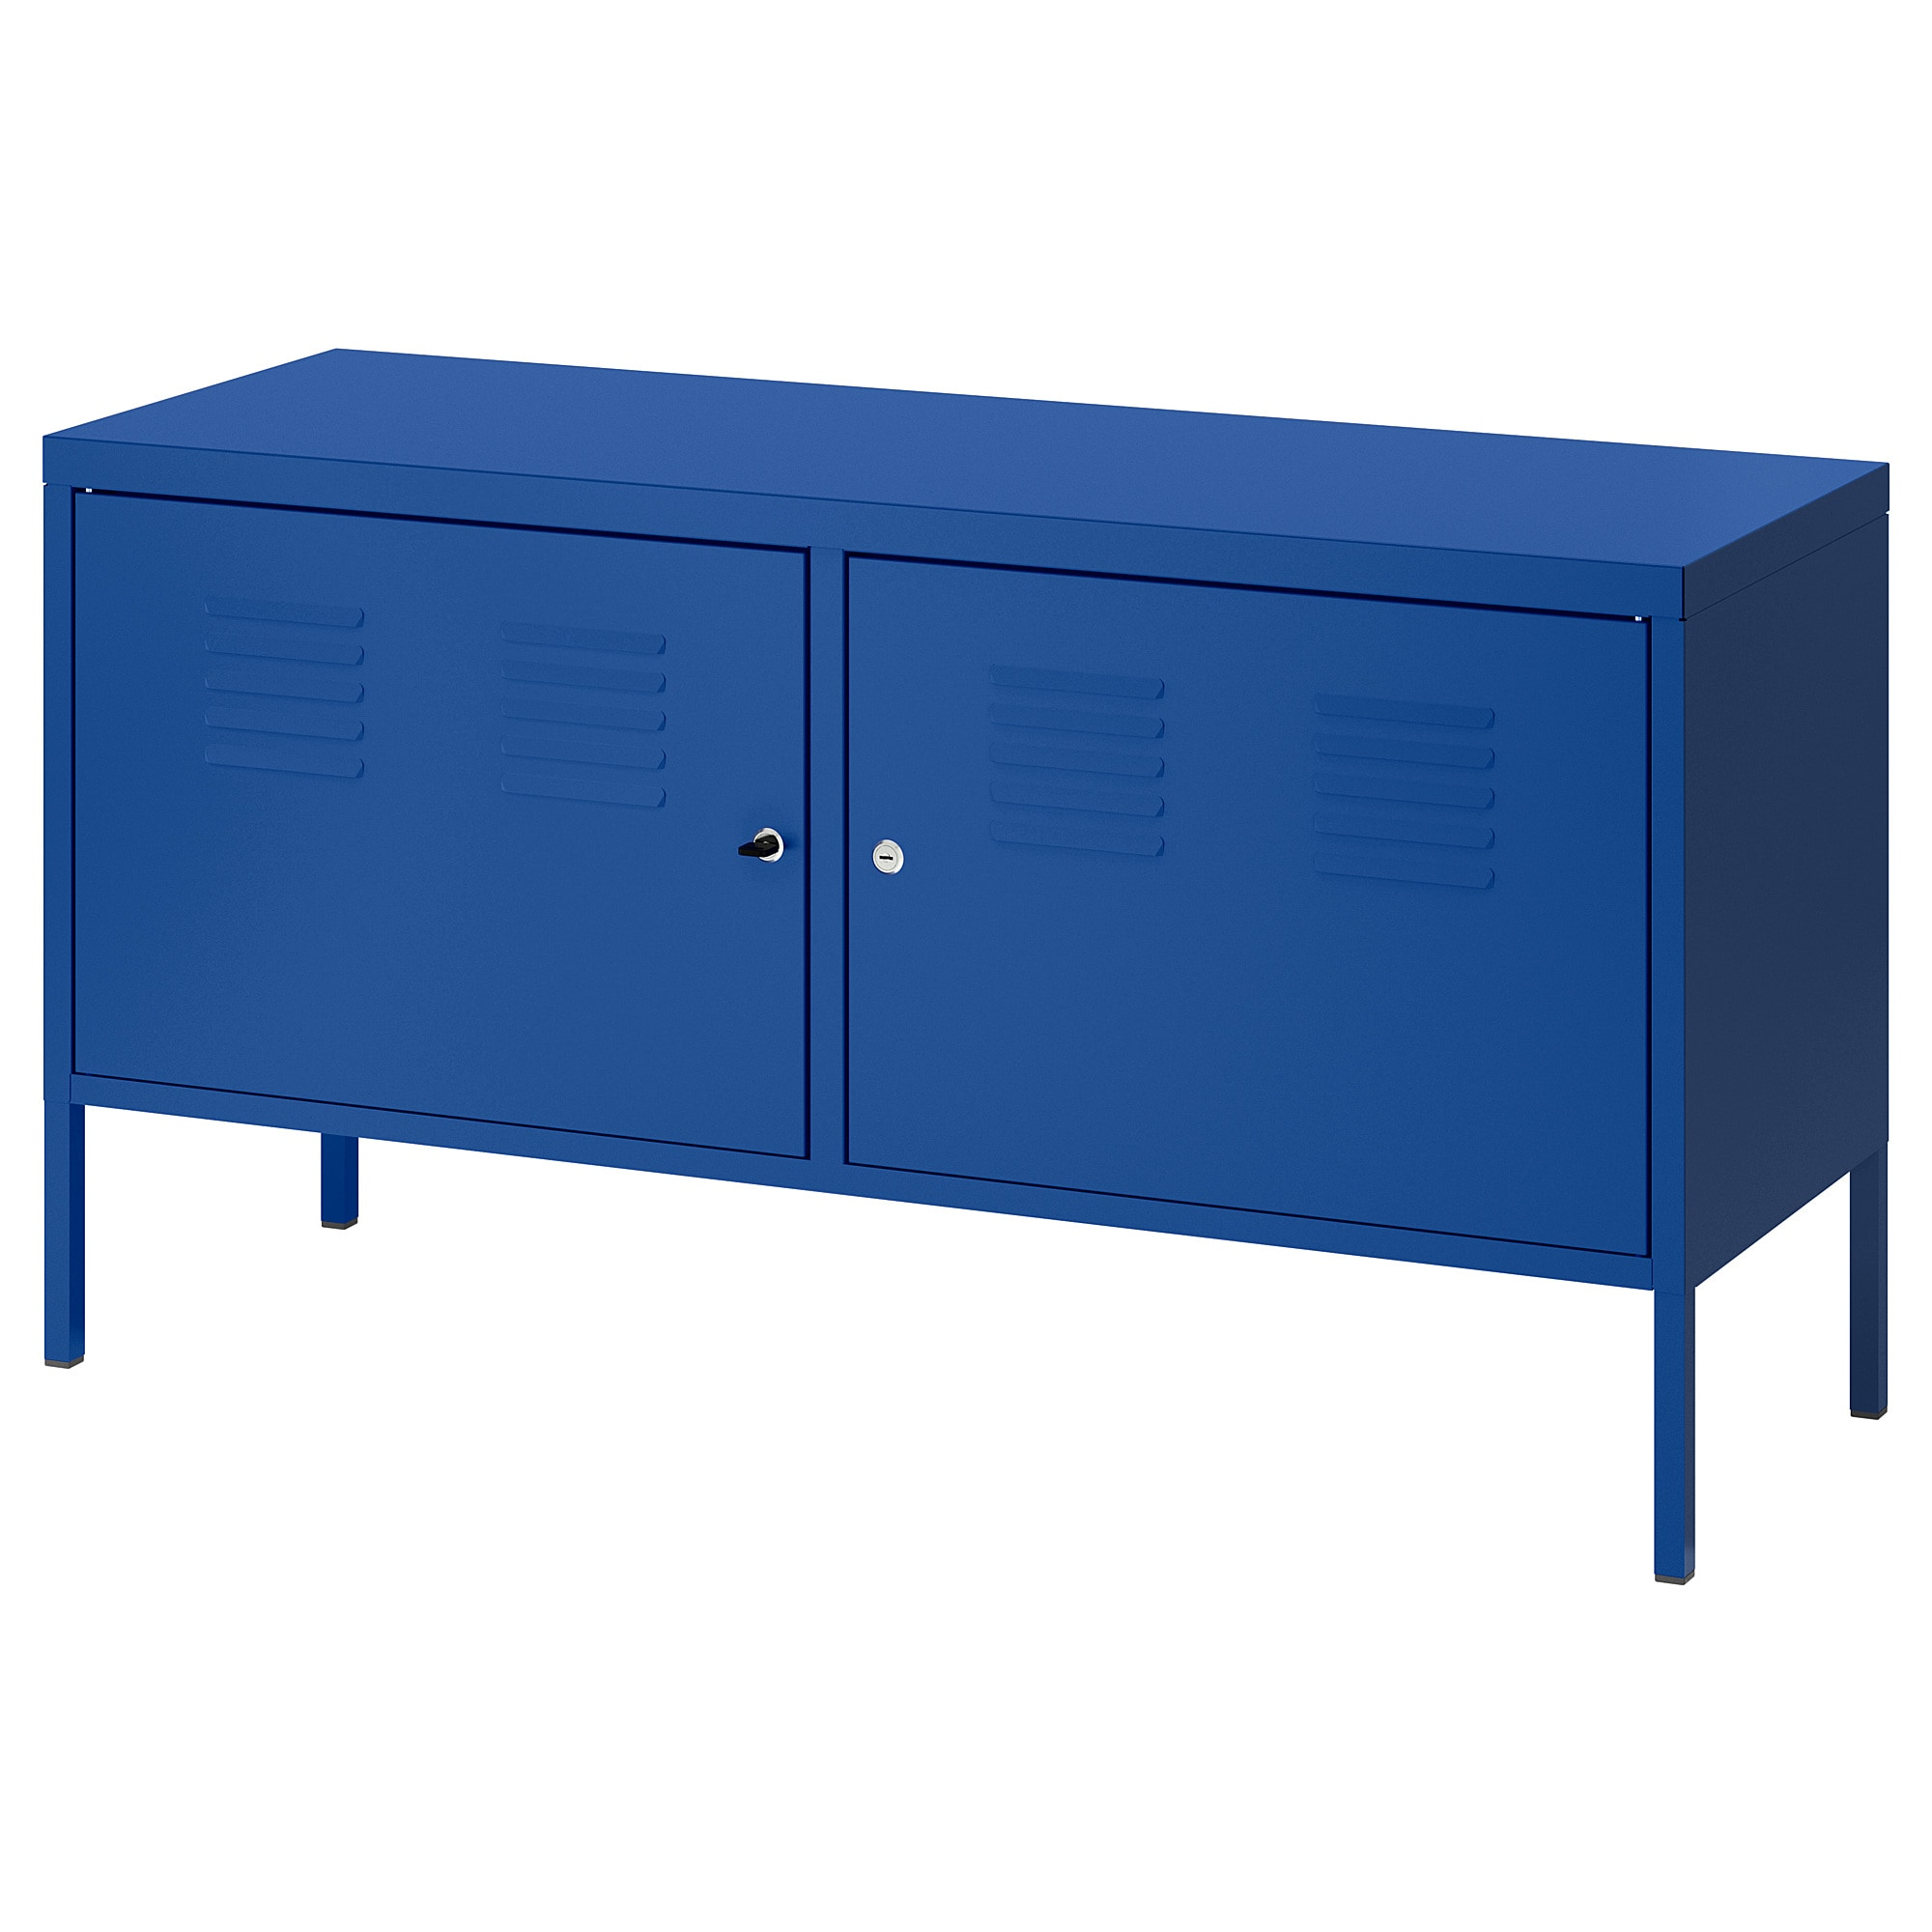 Шкаф ИКЕА ПС синий артикуль № 903.842.73 в наличии. Онлайн магазин IKEA РБ. Недорогая доставка и соборка.